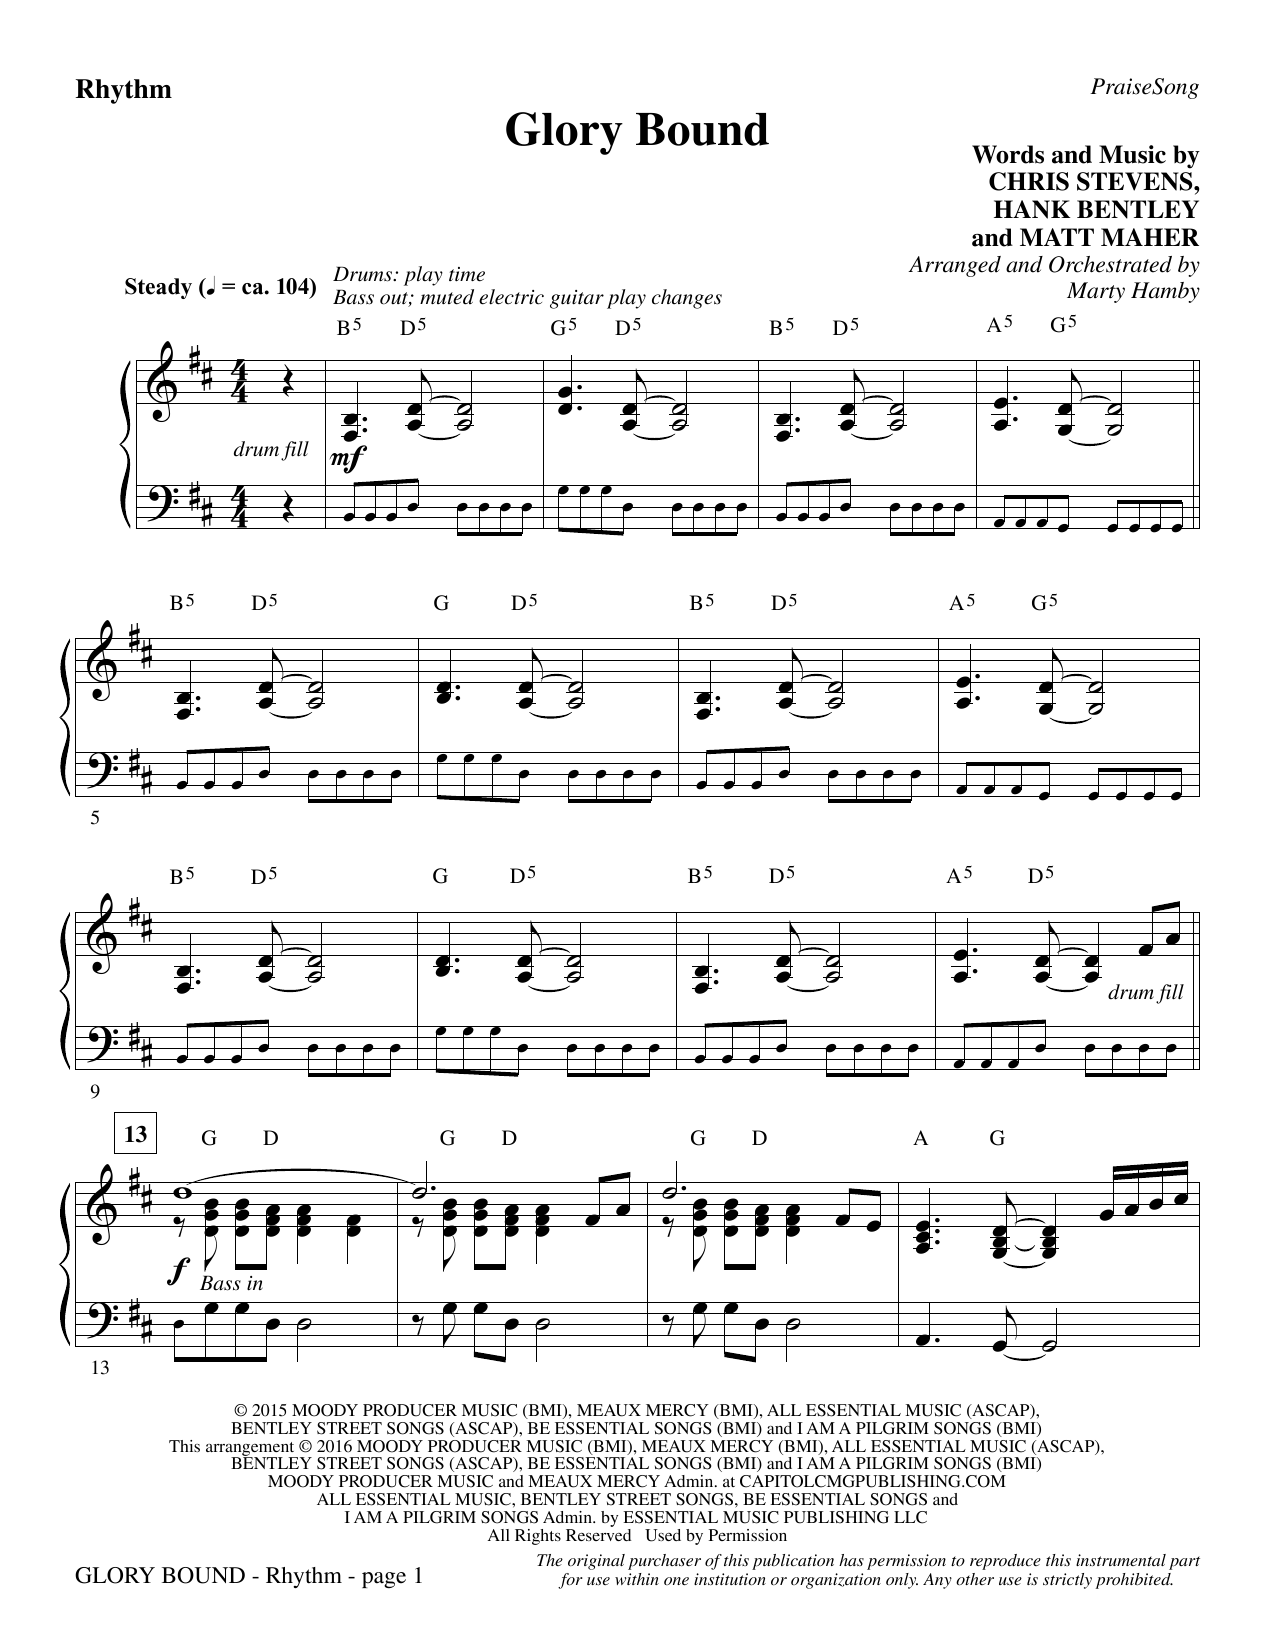 Glory Bound - Rhythm Sheet Music